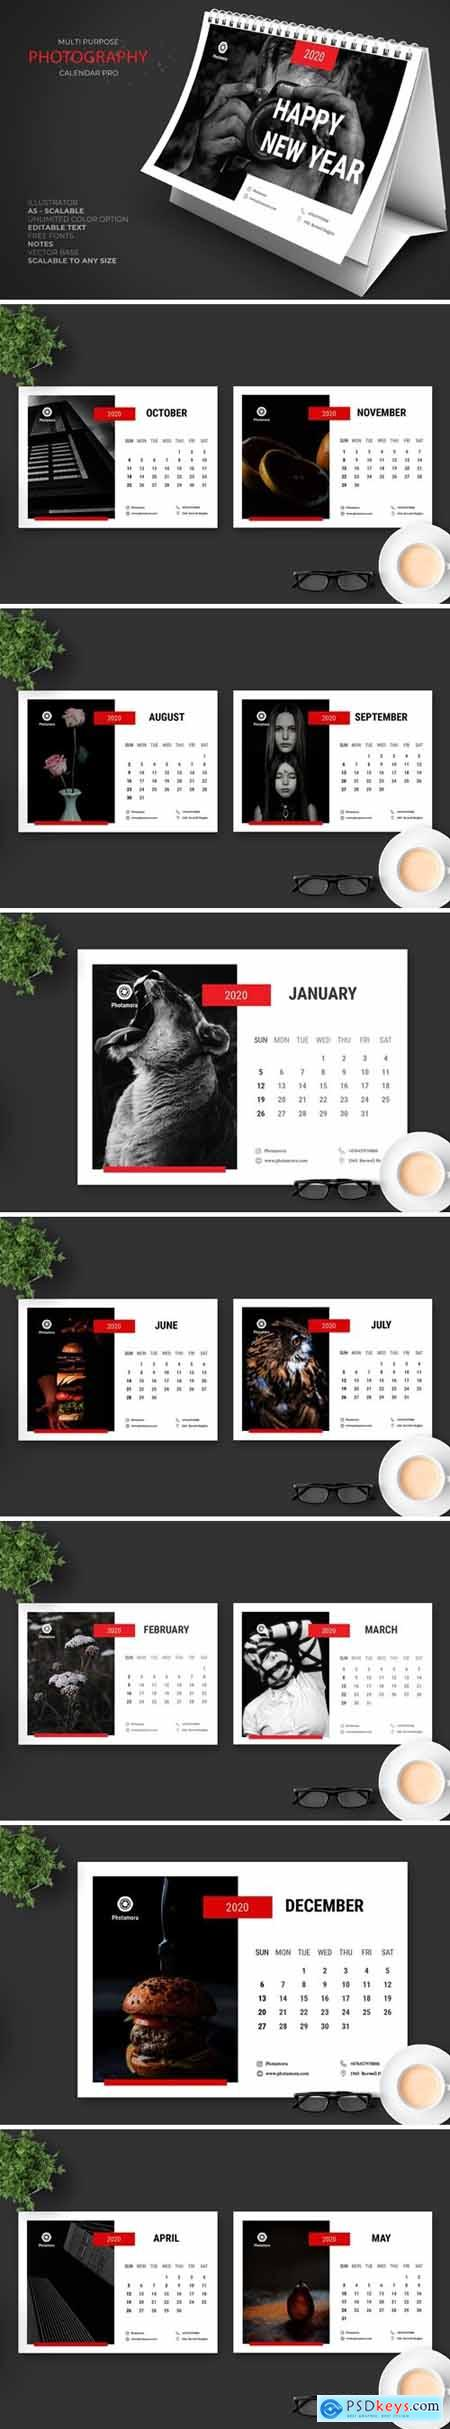 2020 Photography Calendar Pro